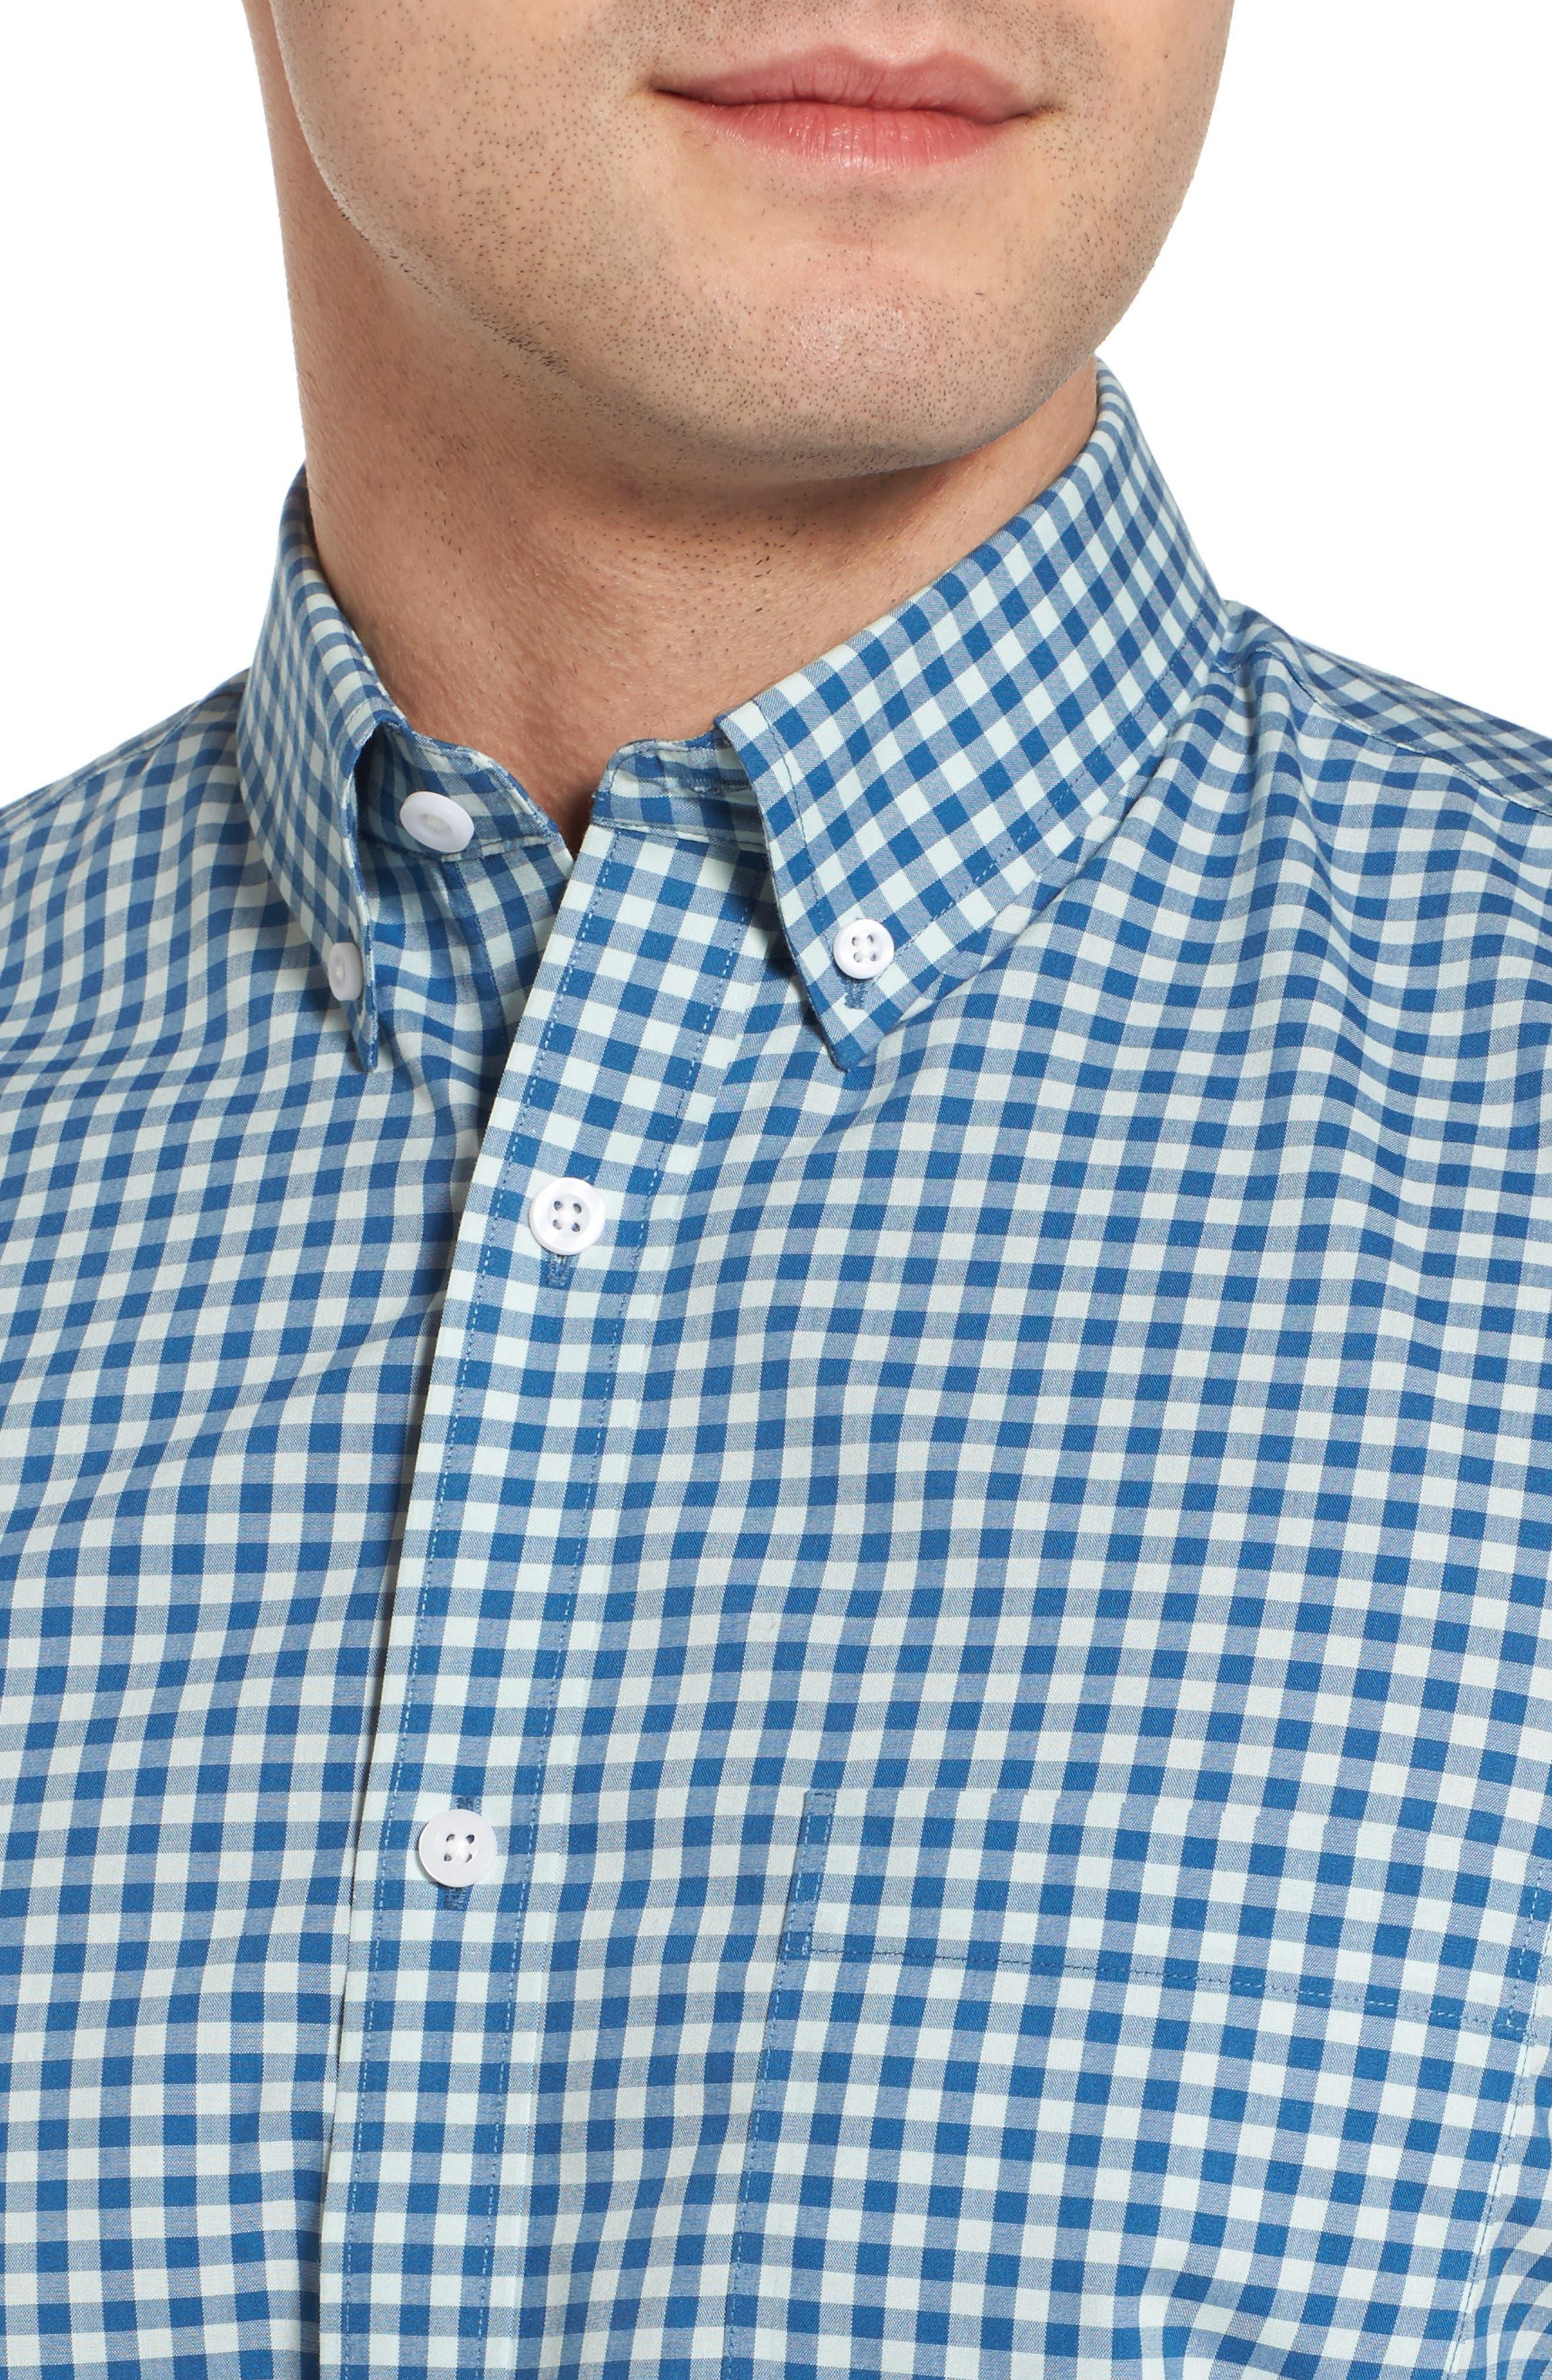 Regular Fit Gingham Sport Shirt,                             Alternate thumbnail 2, color,                             Teal Surf Blue Gingham